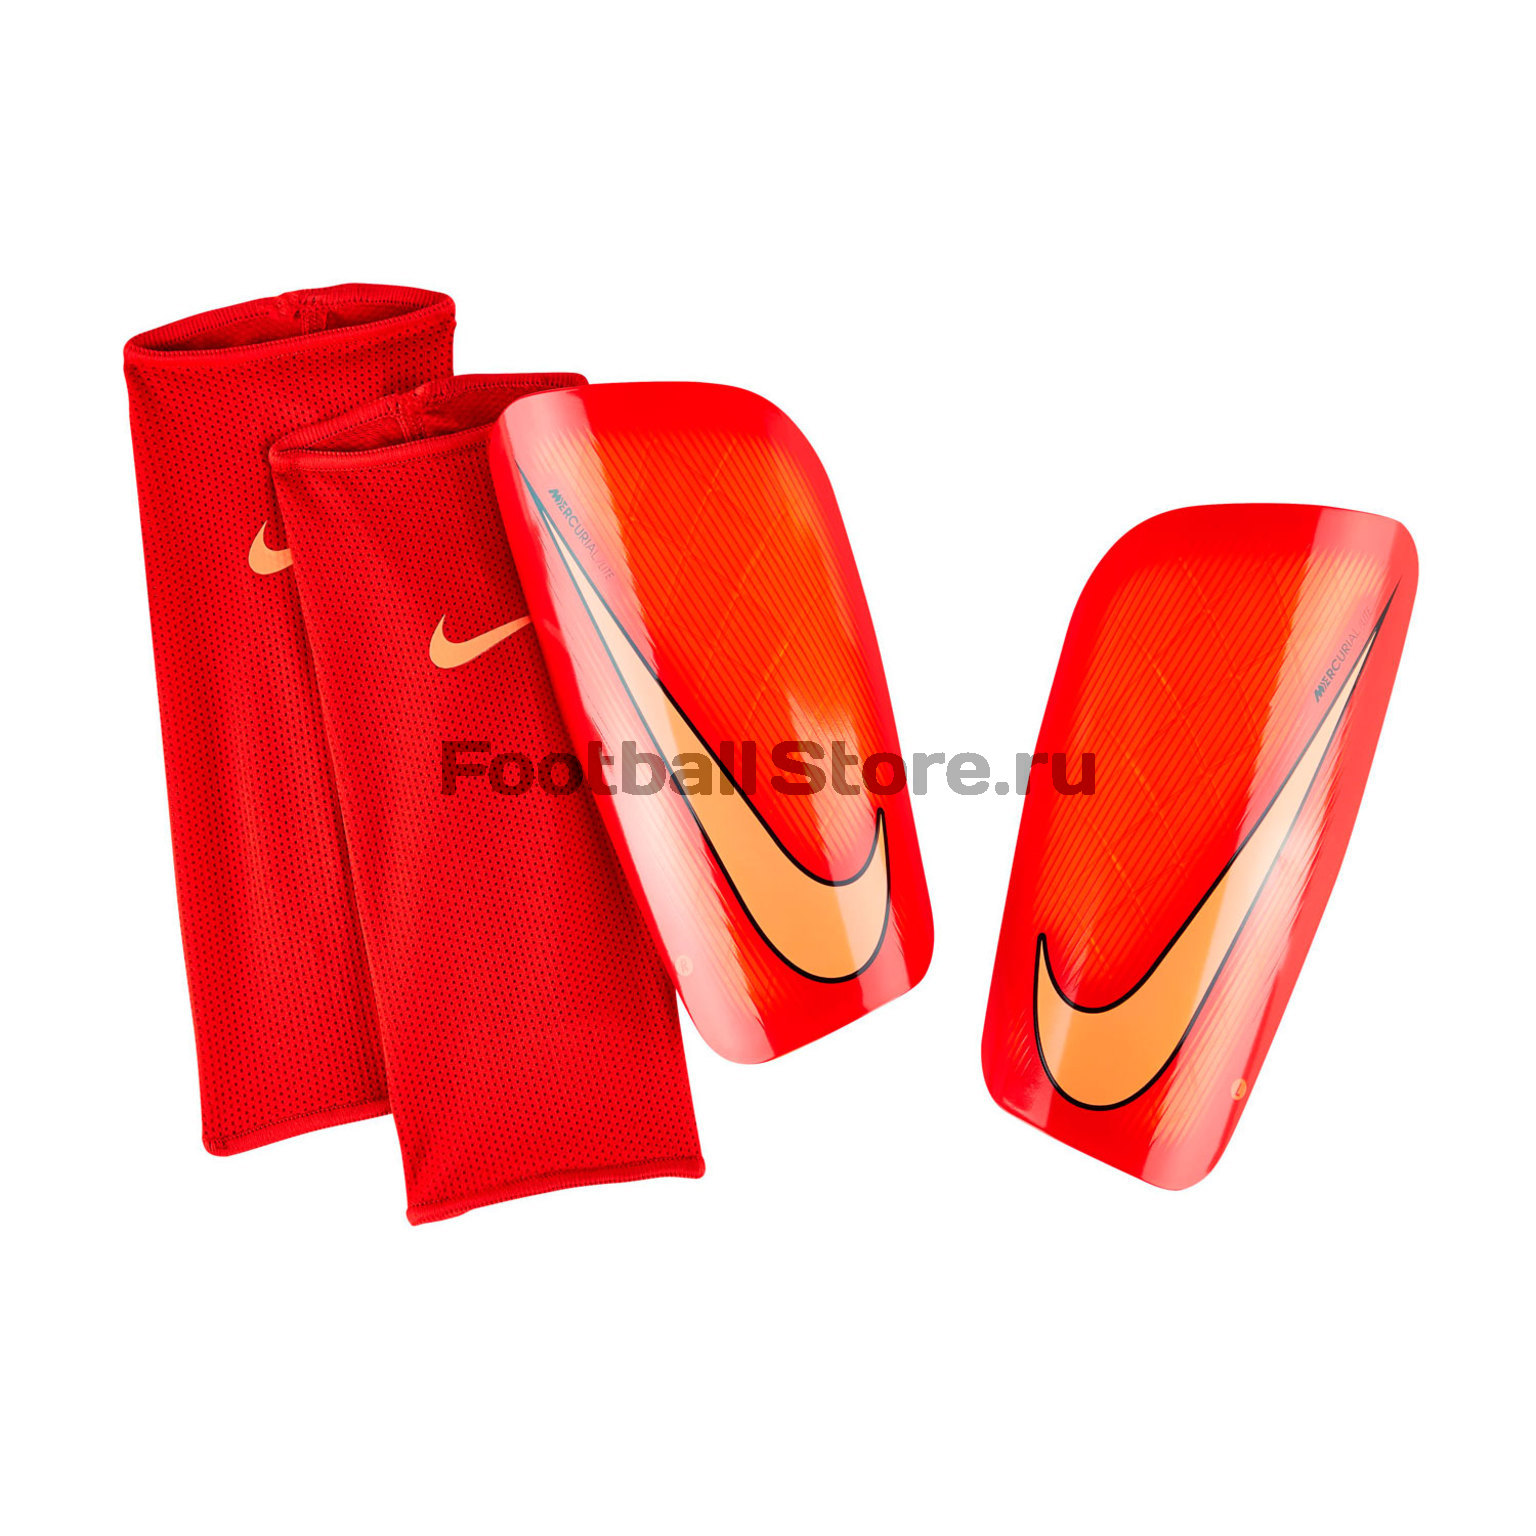 Защита ног Nike Щитки футбольные Nike Mercurial Lite SP2086-876 nike nike mercurial lite